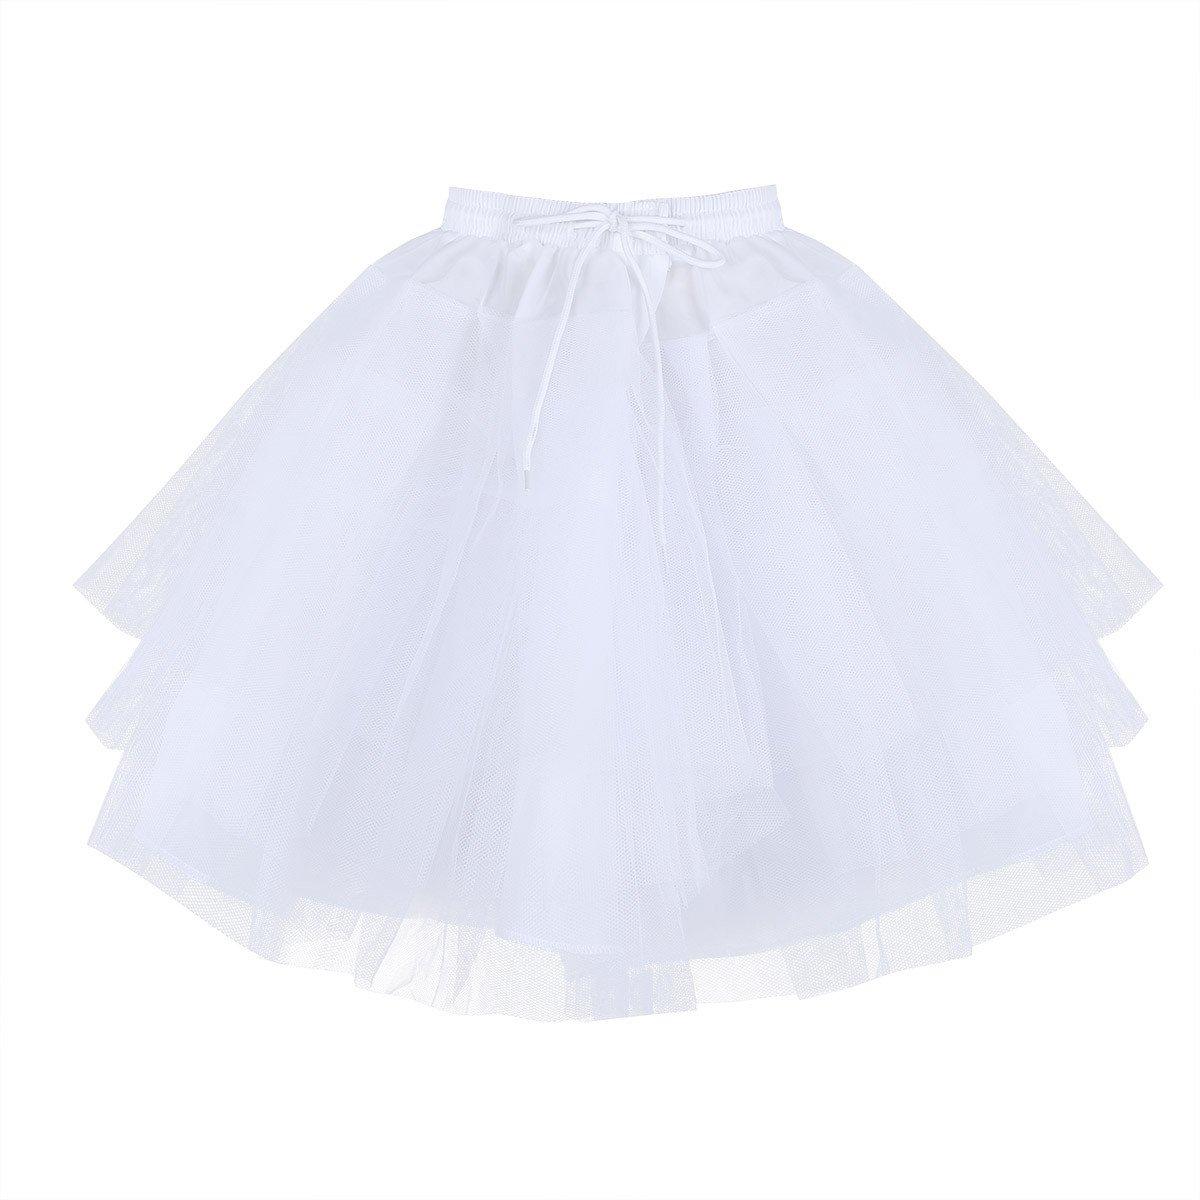 ,Freebily Kids Girls 3 Layers Net Petticoat Underskirt Crinoline Slip for Flower Girls Wedding Dress White One Size